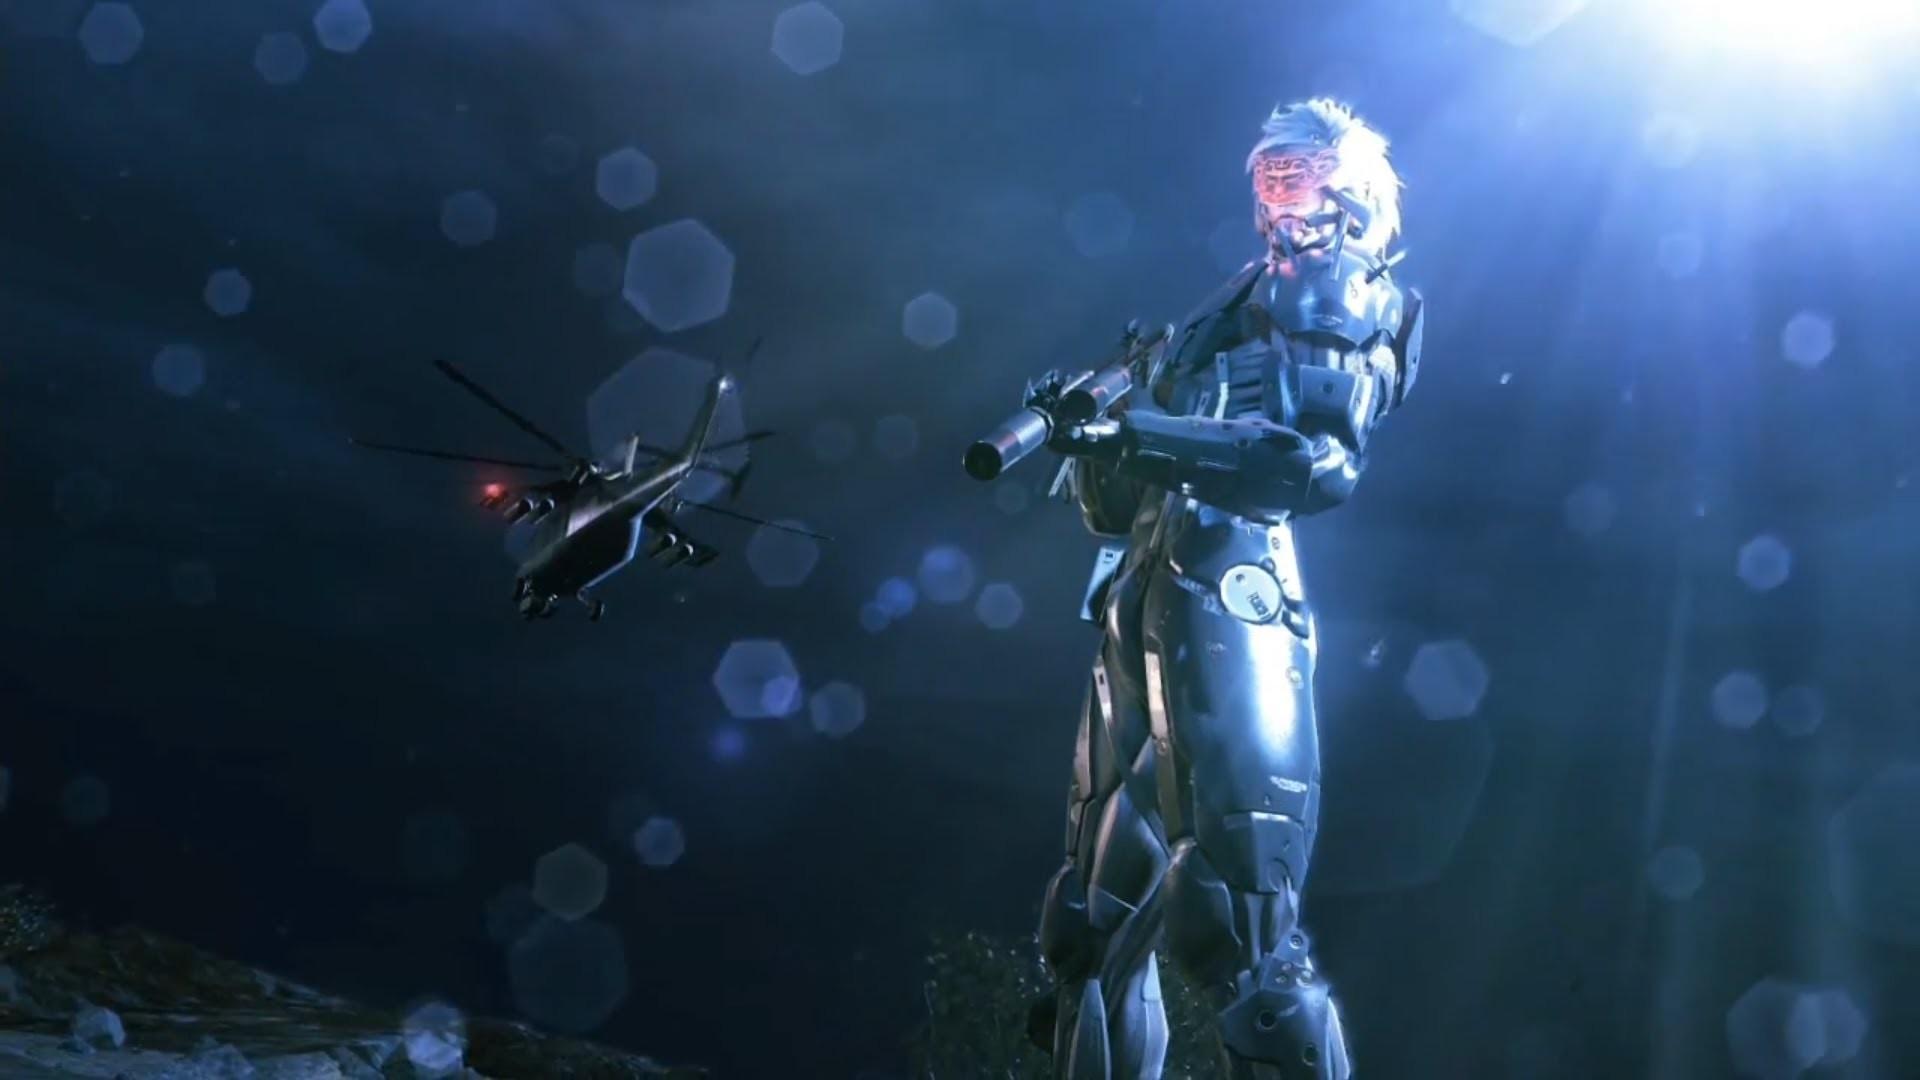 Metal Gear Solid 5 Ground Zeroes – Raiden Trailer (Xbox Exclusive)